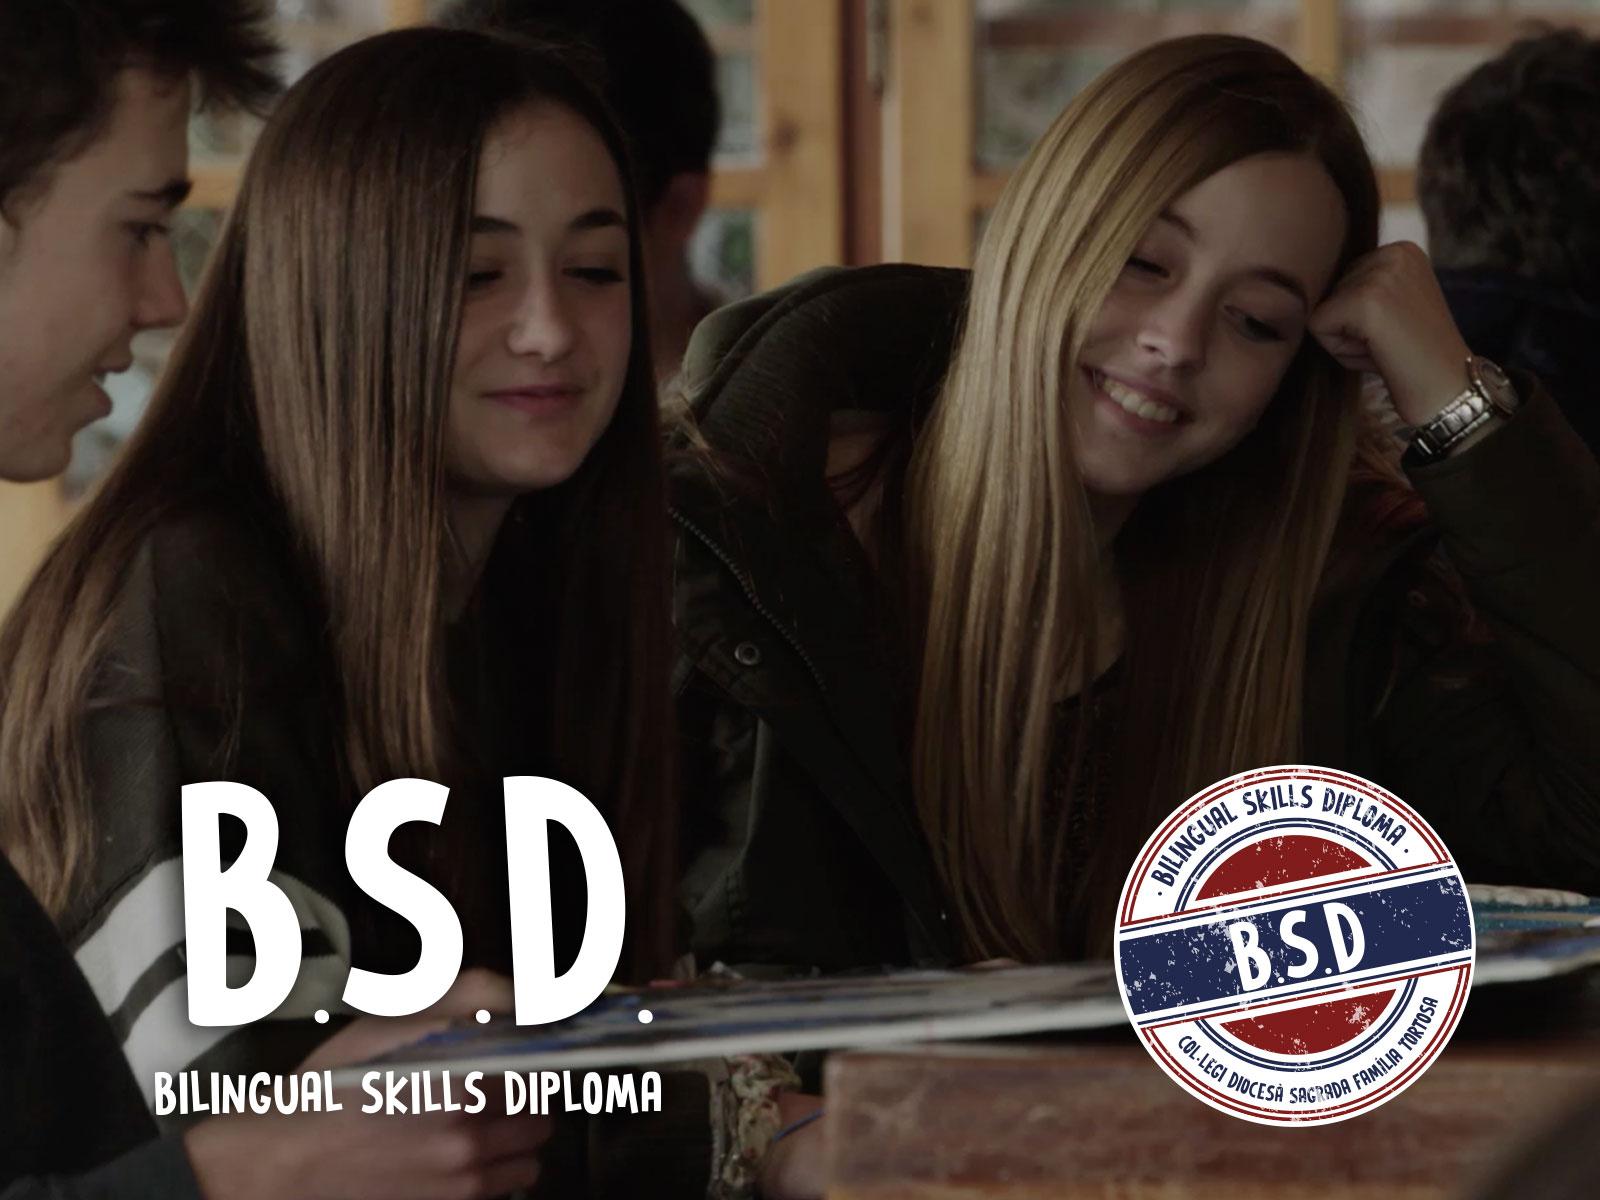 Bilingual Skills Diploma